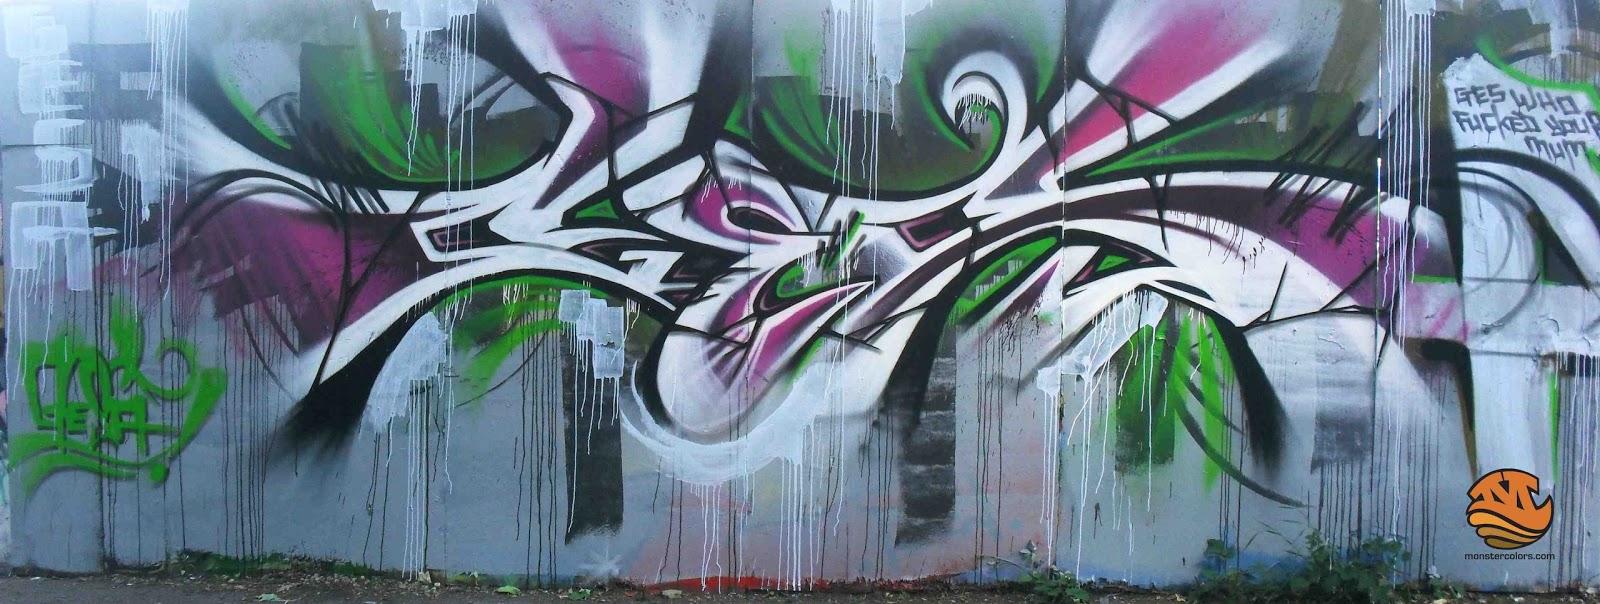 Best graffiti spray paint - Cell teck